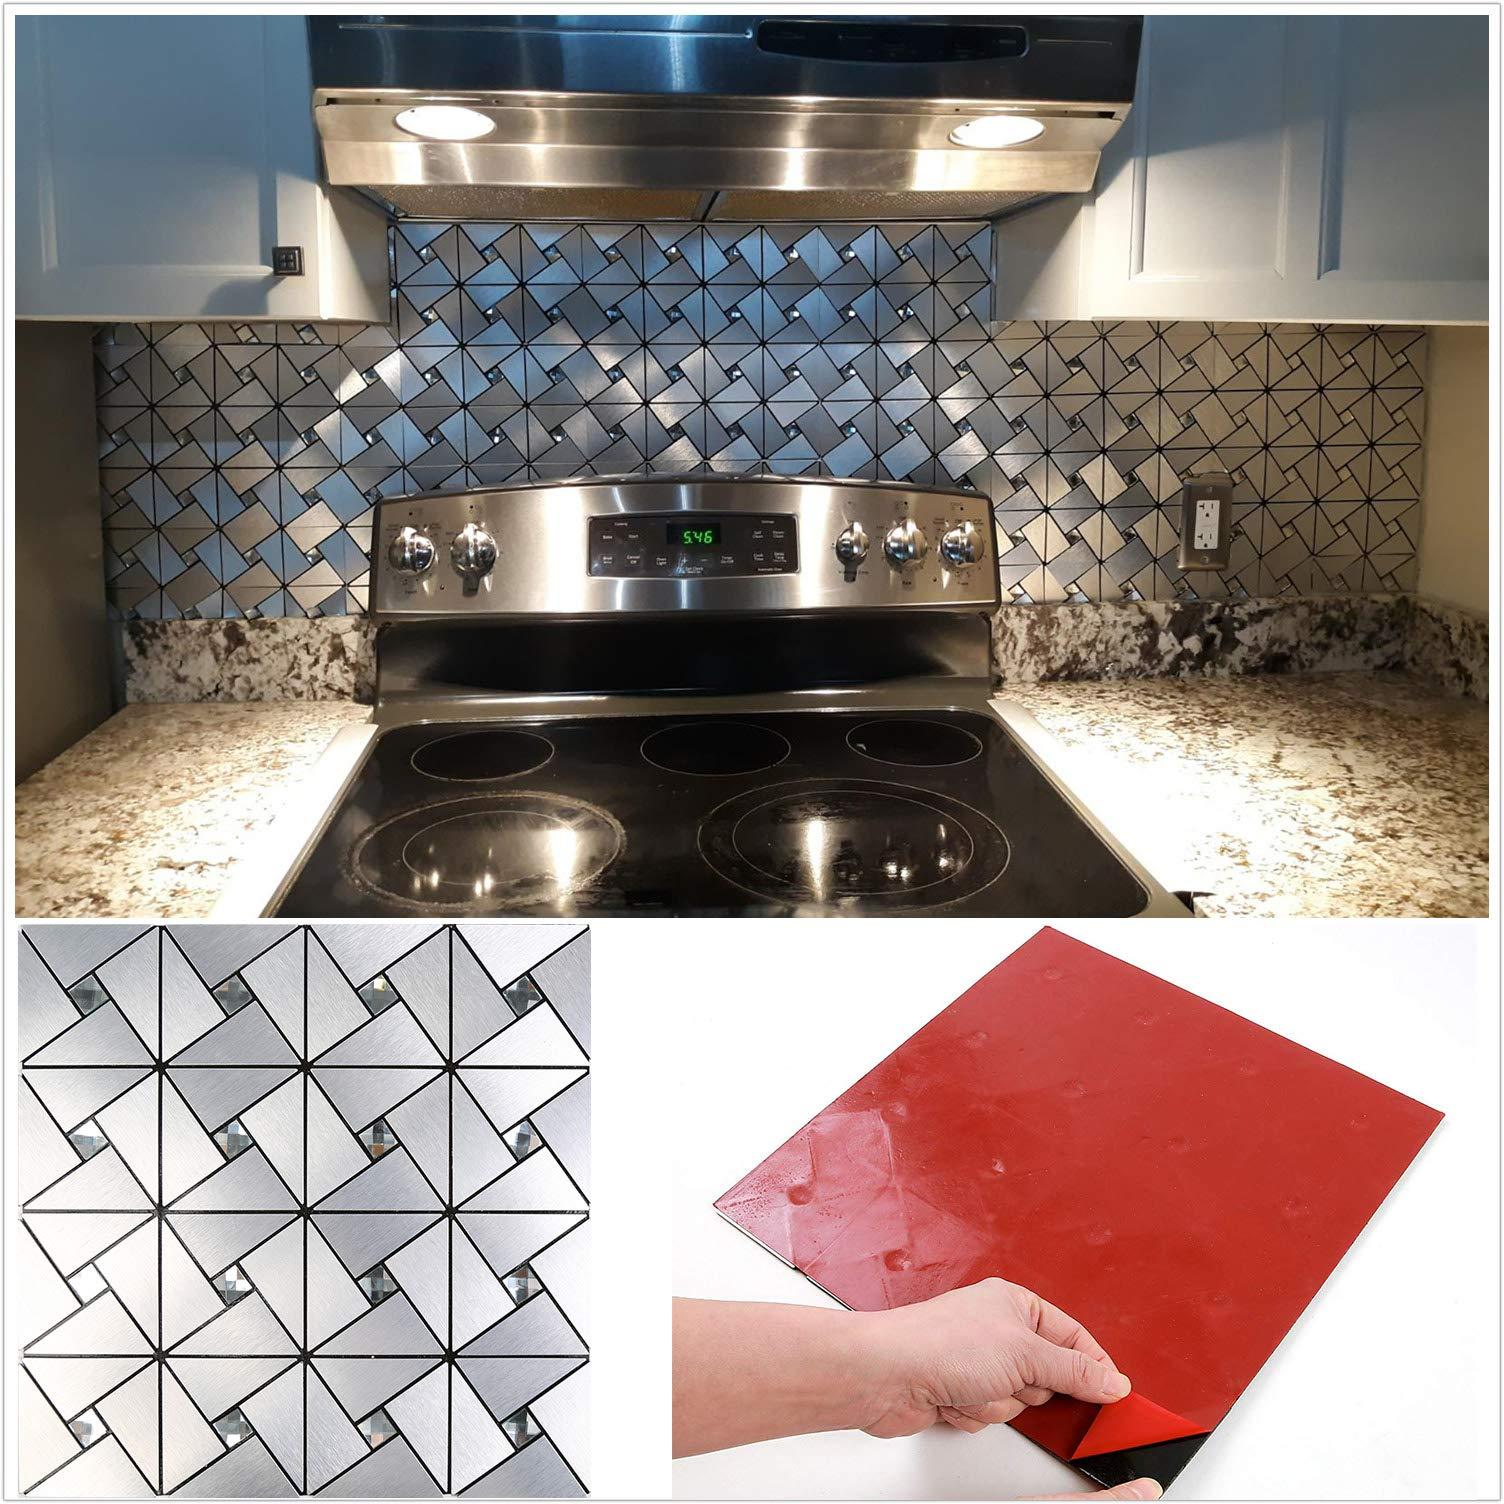 Homeymosaic Peel And Stick Tile Backsplash Stick On Kitchen Wall Decor Aluminum Surface Metal Mosaic Smart Tiles Wall Sticker Windmill Puzzle Glass Mixed 12 X12 X 5 Sheets